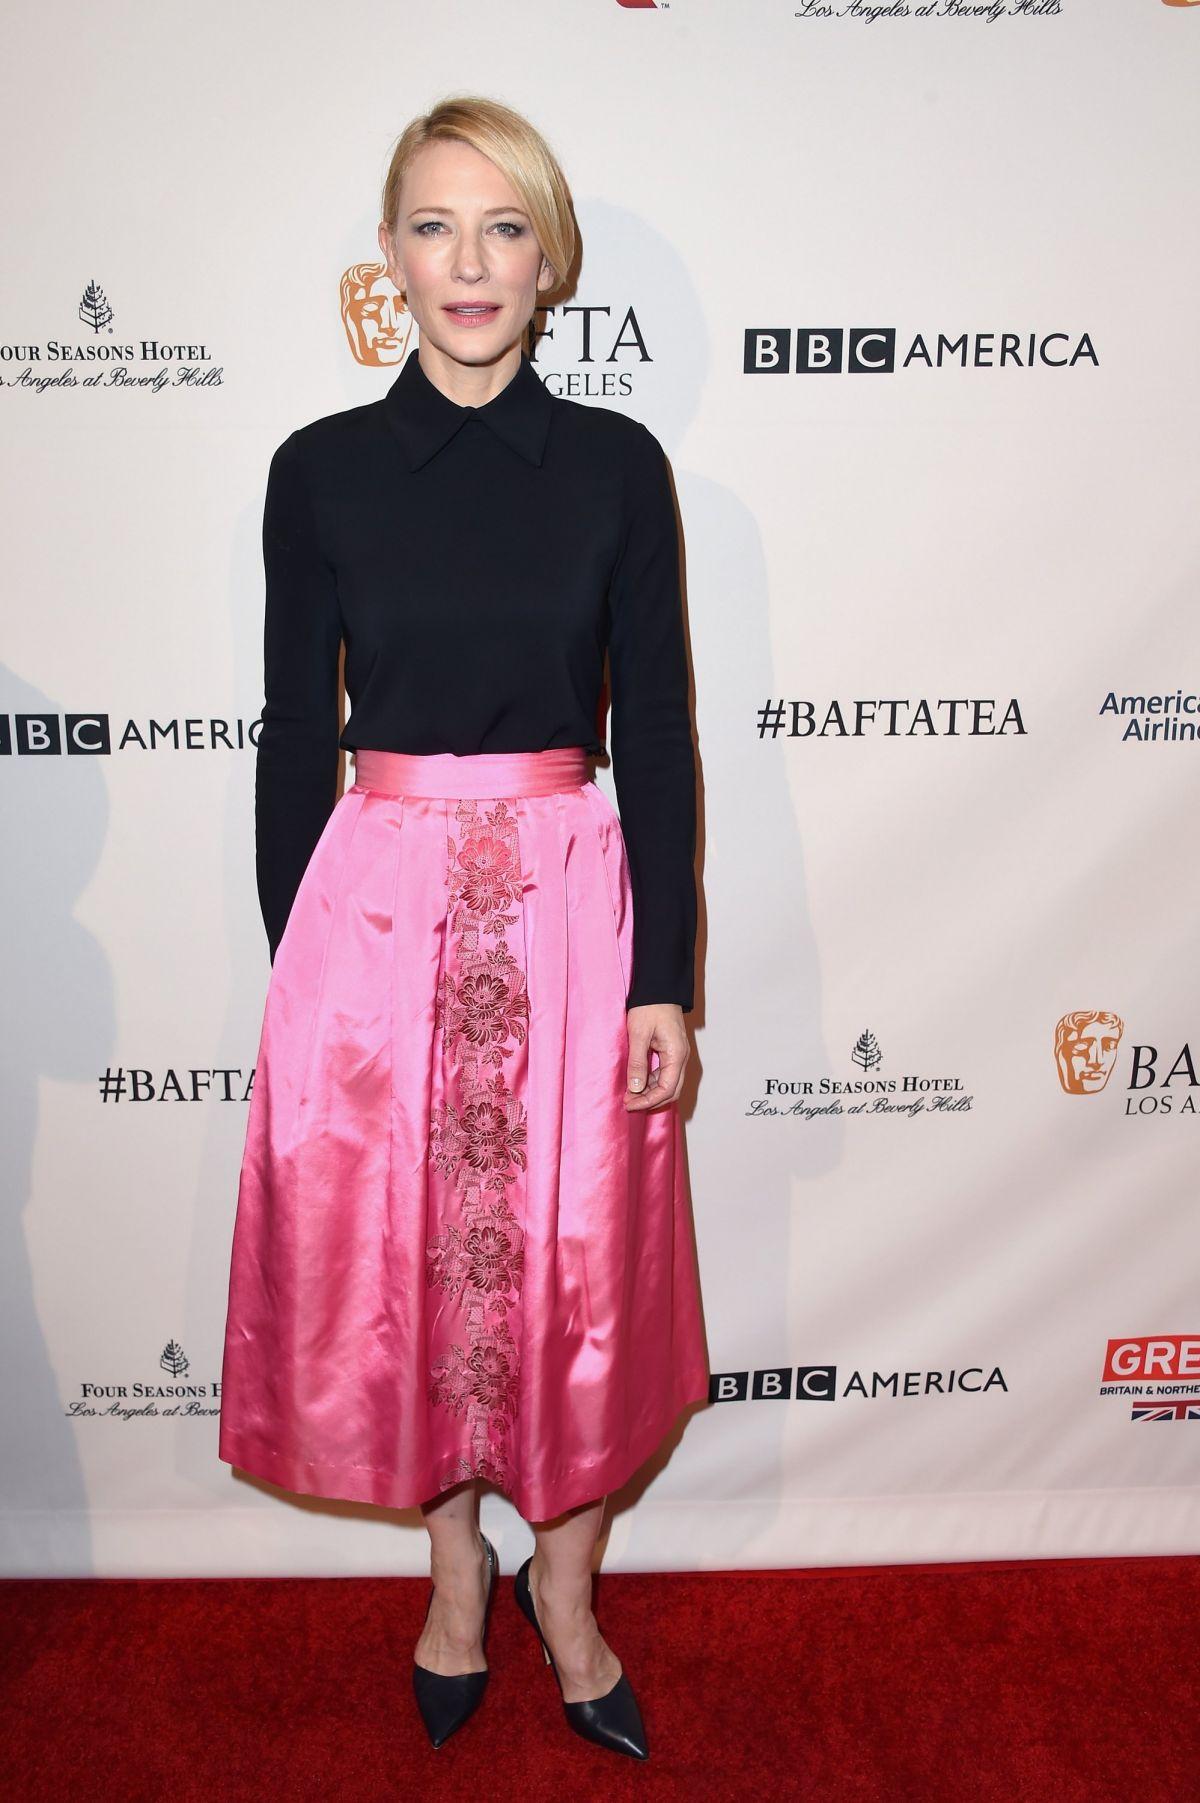 CATE BLANCHETT at BAFTA Los Angeles Awards Season Tea in ... Cate Blanchett 2016